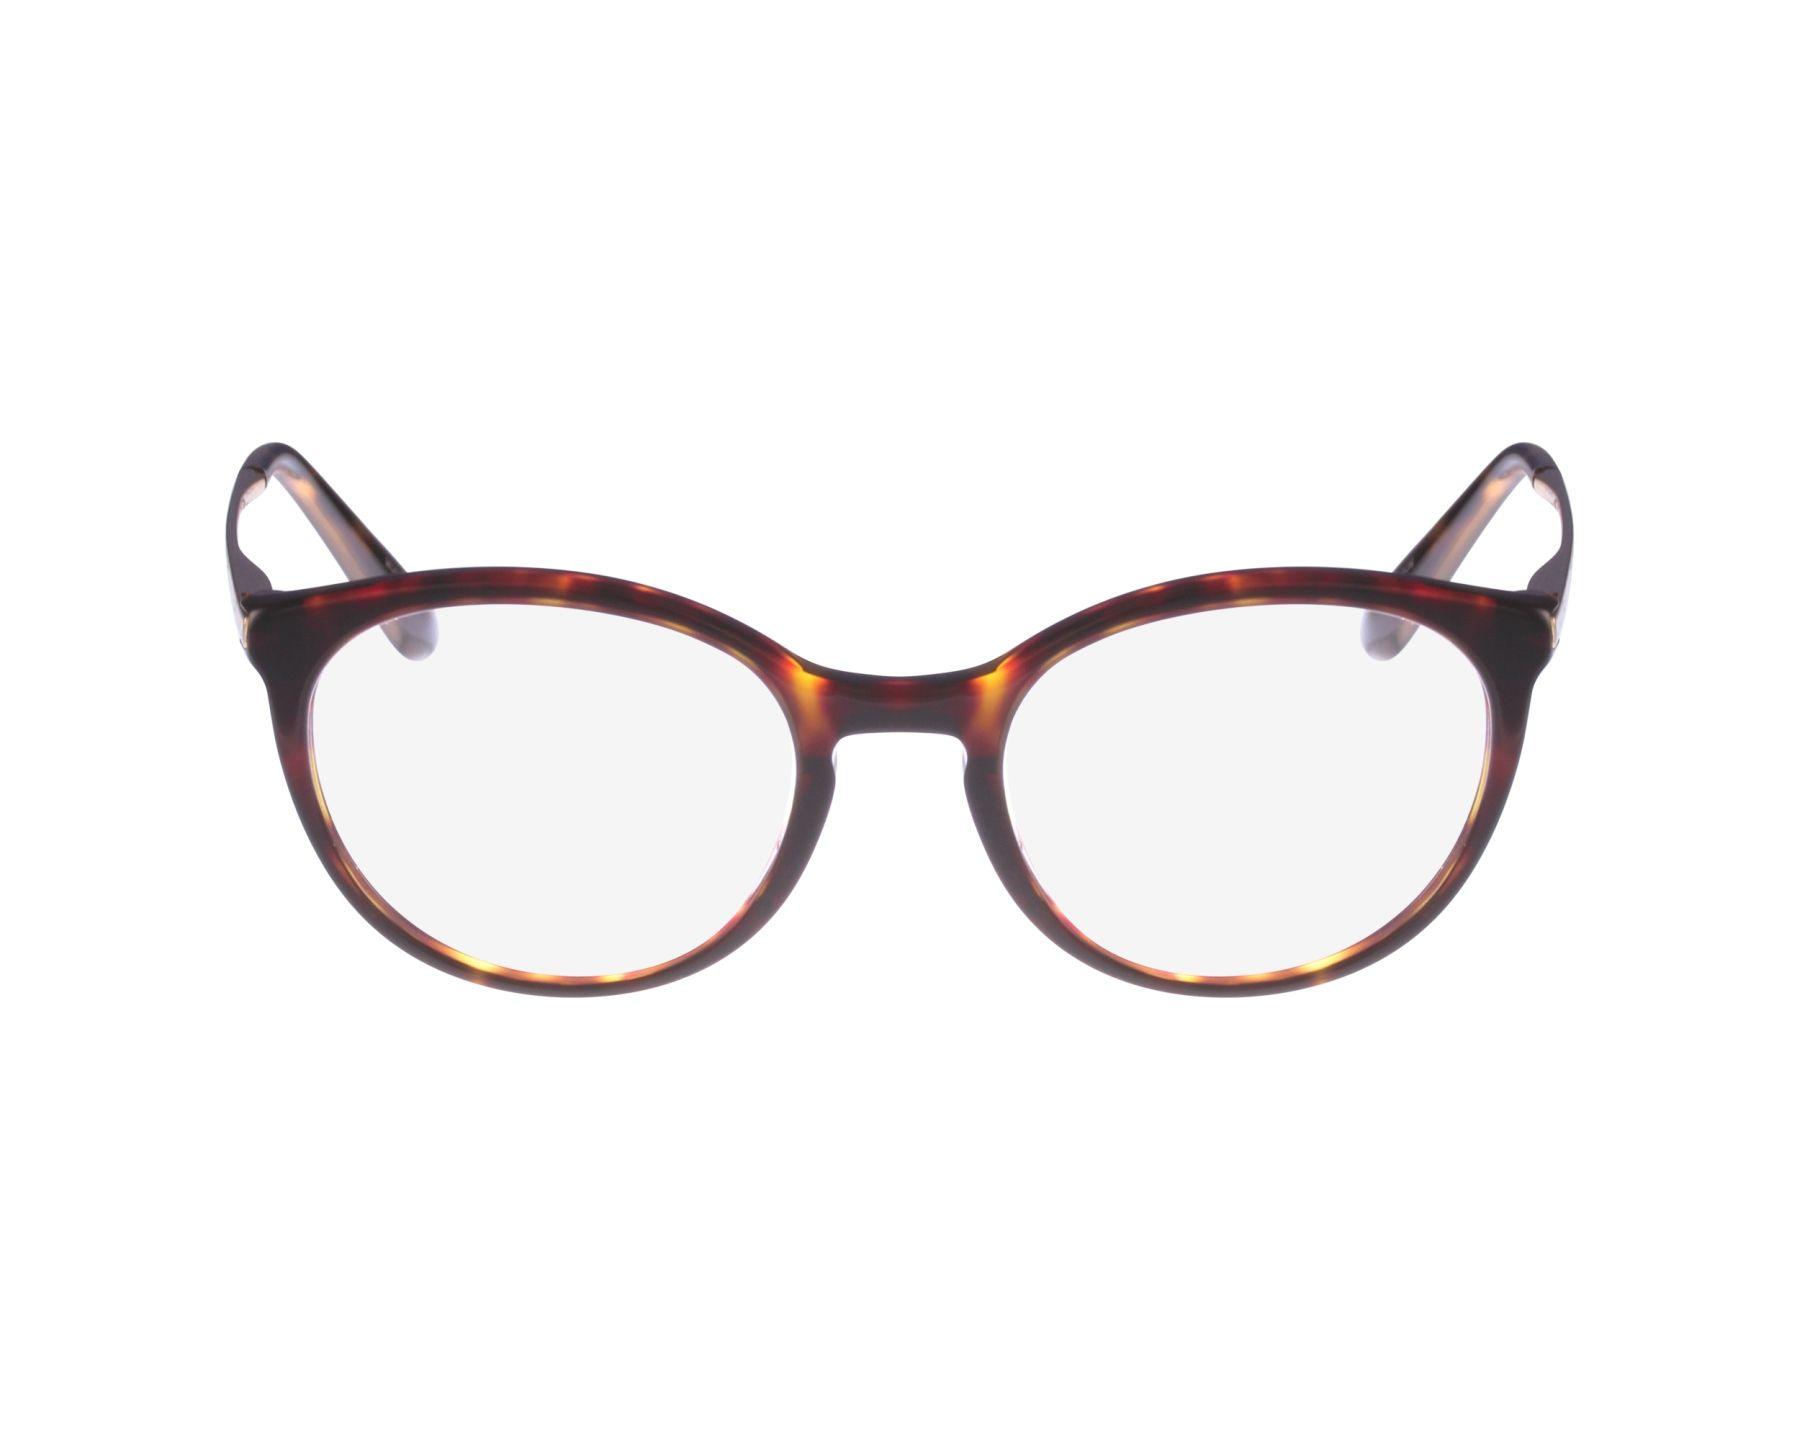 d1819b8e6093 eyeglasses Dolce   Gabbana DG-3242 502 48-18 Havana Gold profile view